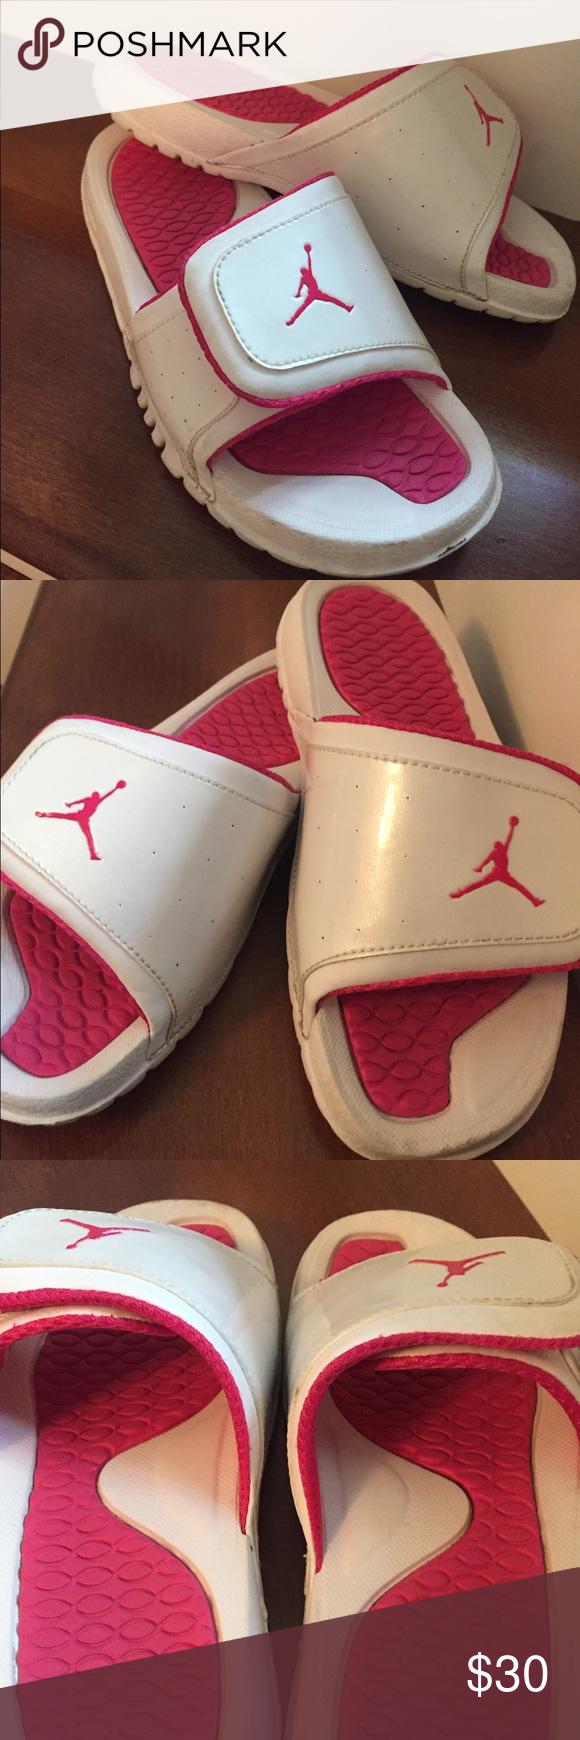 d90800d2ff742 Girls pink and white Jordan Slides In perfect condition! Hardly worn! Jordan  Shoes Sandals   Flip Flops